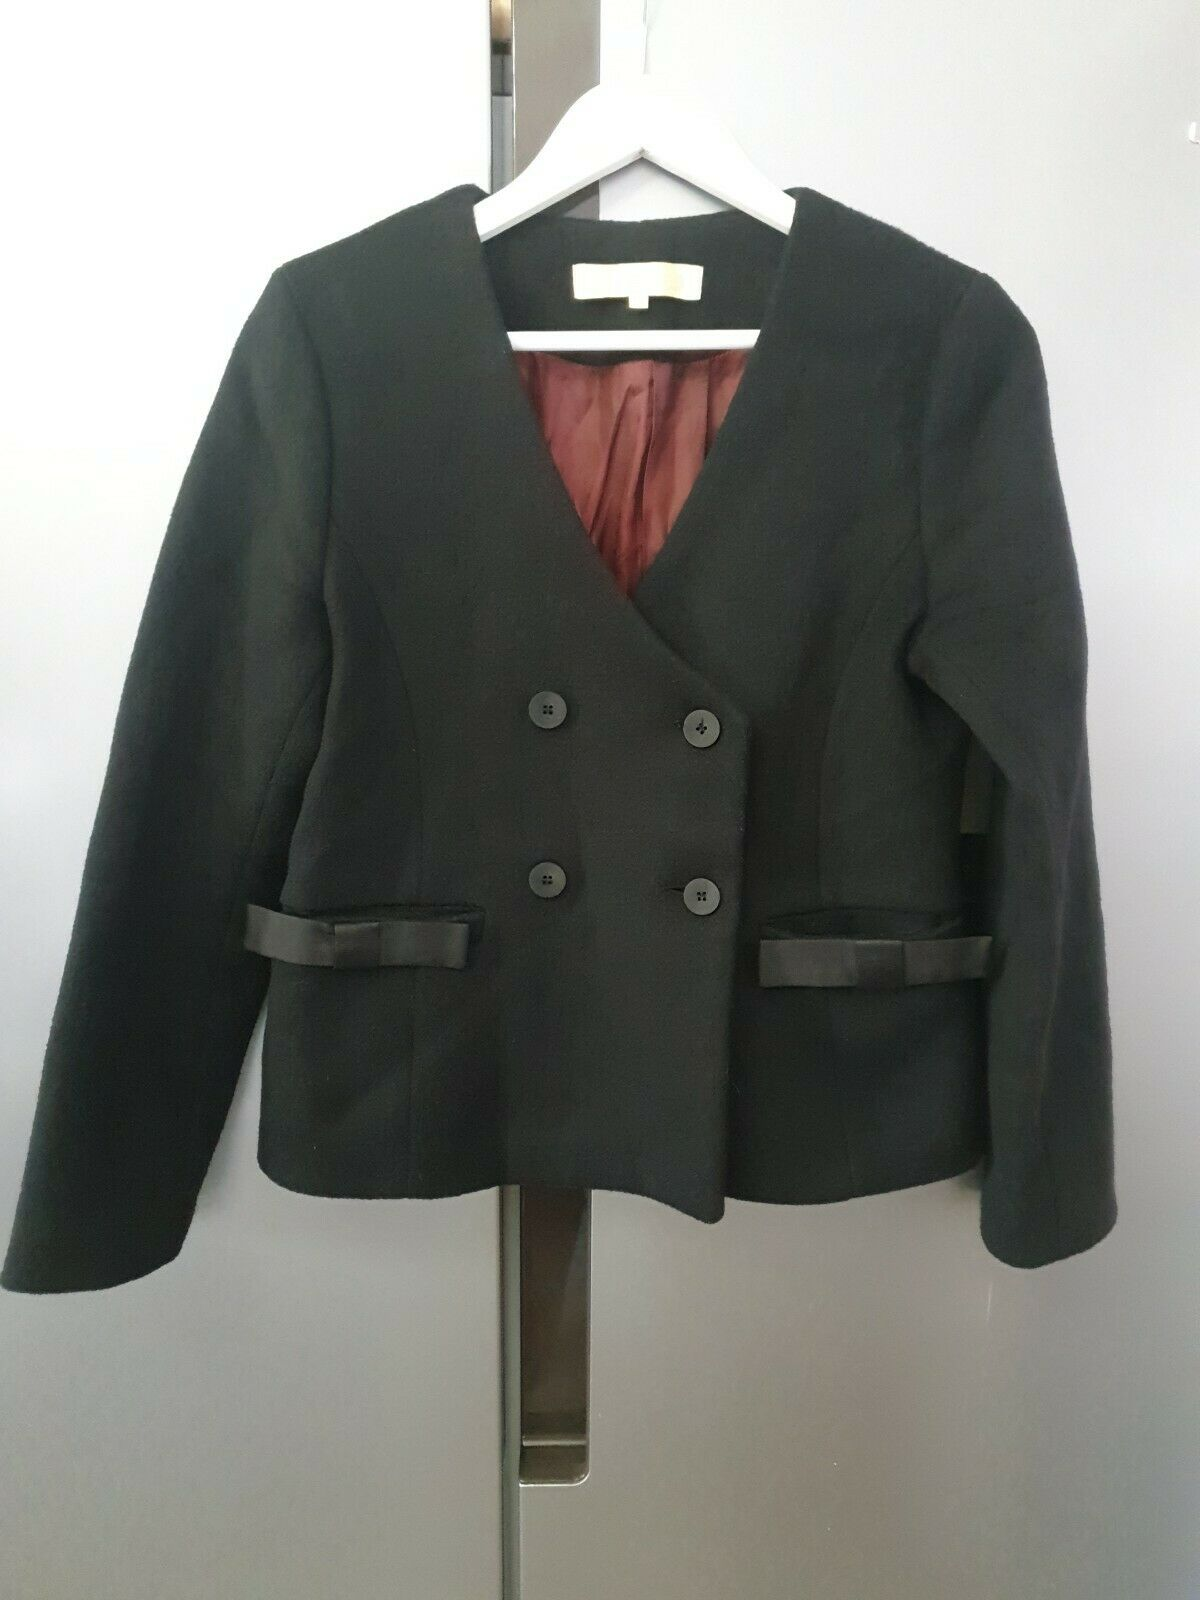 Bonsui Women's Smart Jacket Blend 65% Wool T2 UK12 Fitted Cropped Waist Length